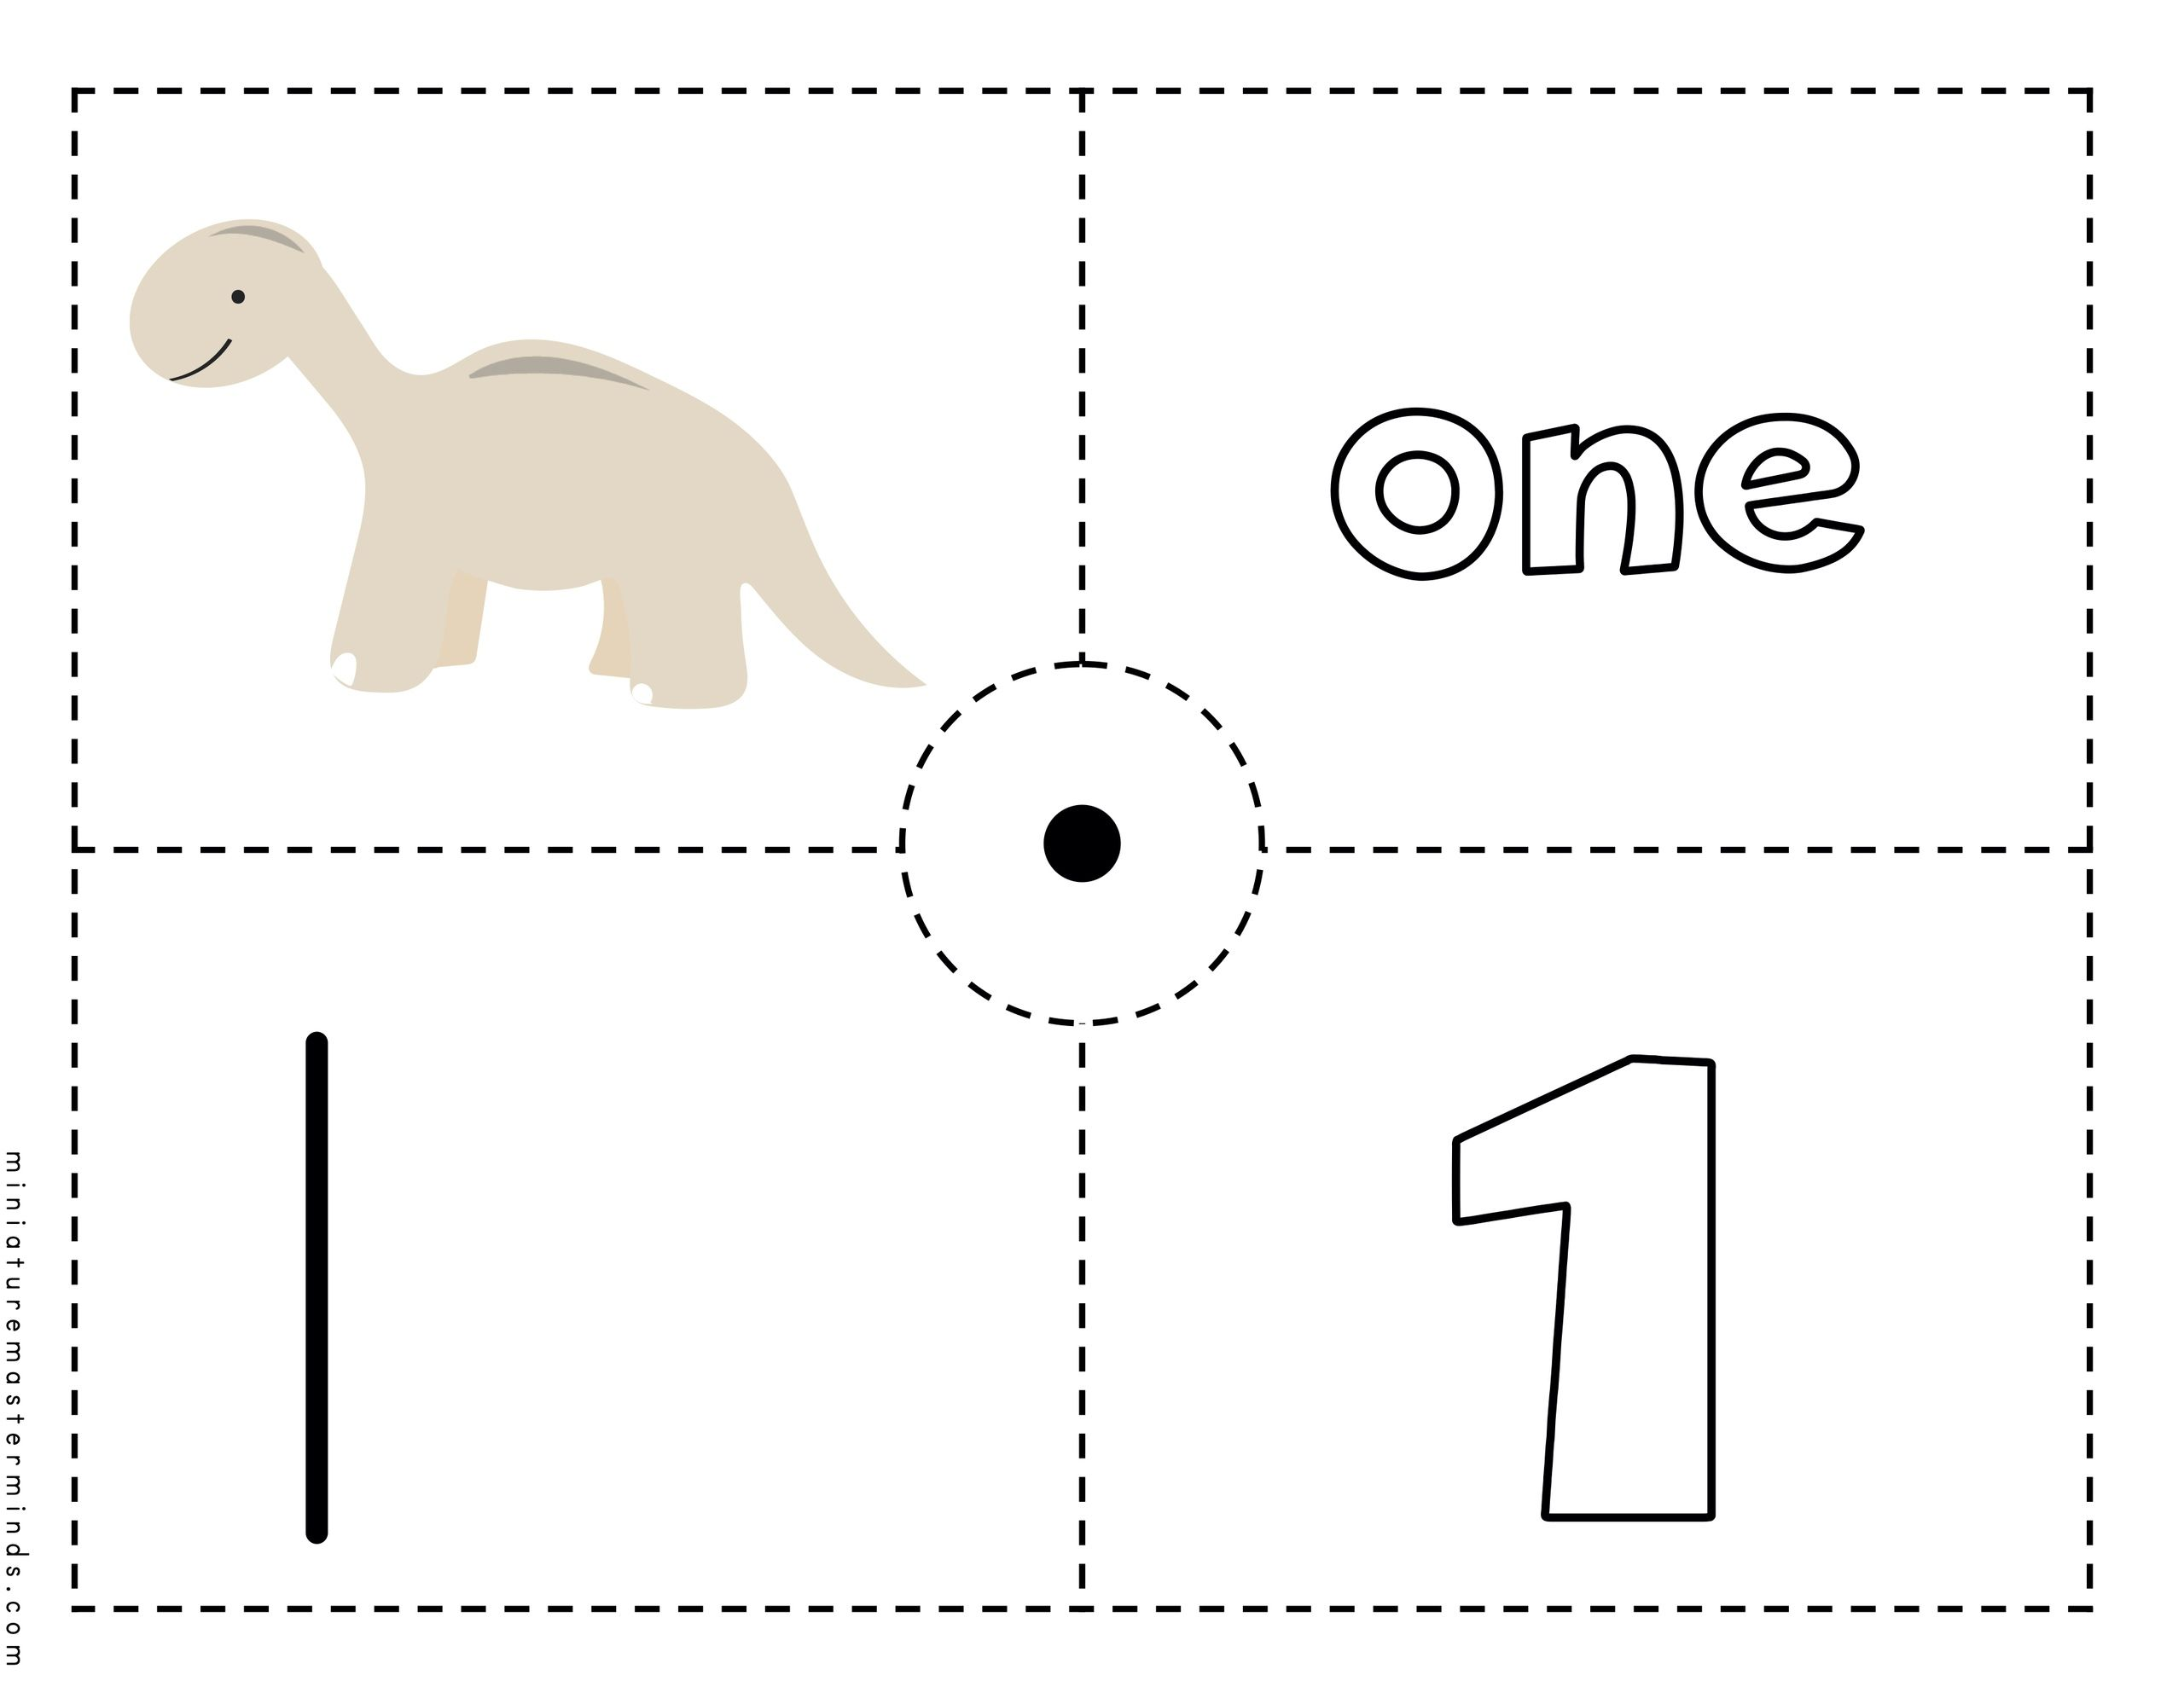 Math Worksheets For Kindergarten In 2020 Kindergarten Worksheets Math Worksheets Kindergarten Math Worksheets